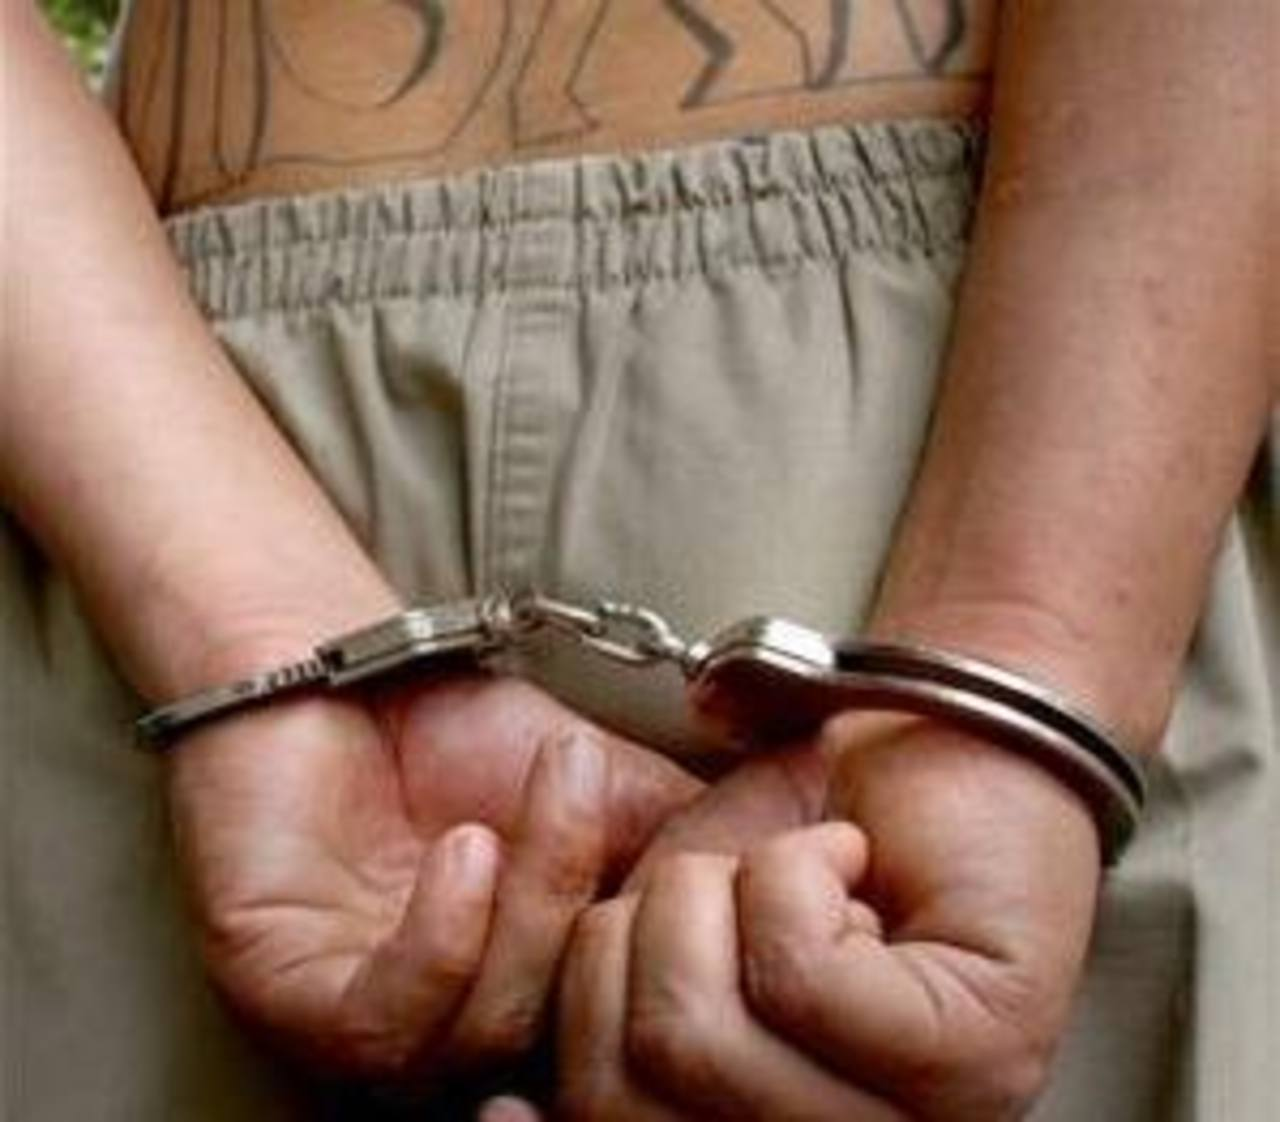 El triple homicidio se registro en Izalco Sonsonate. FOTO EDH